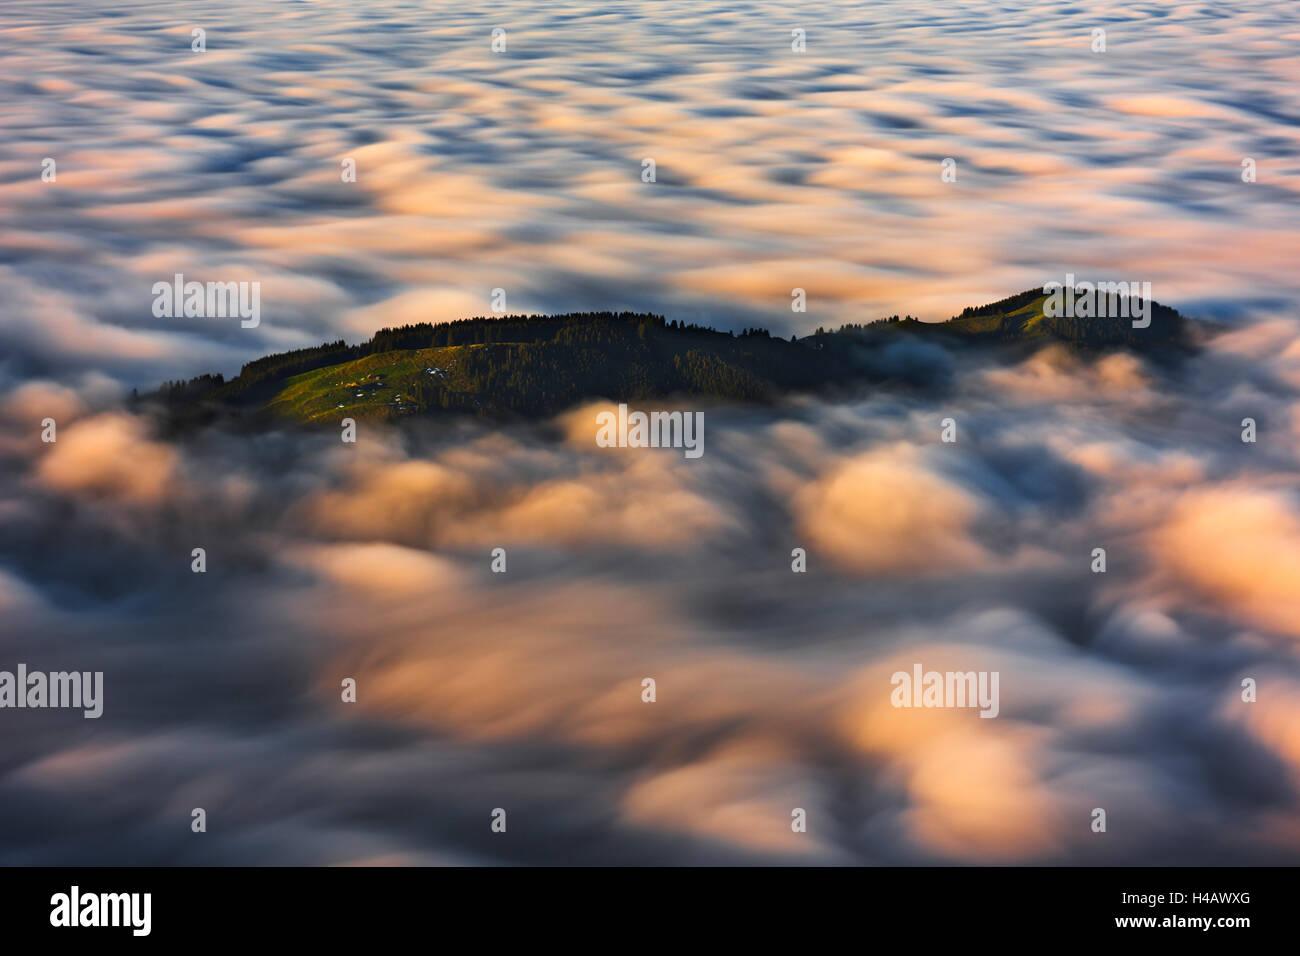 Alpen, Schweiz, Appenzell, Wolken, Nebel, hoch, Insel, Licht, Farbe, Herbst, Ansicht, Meer, Bewegung, Langzeitbelichtung, Stockbild